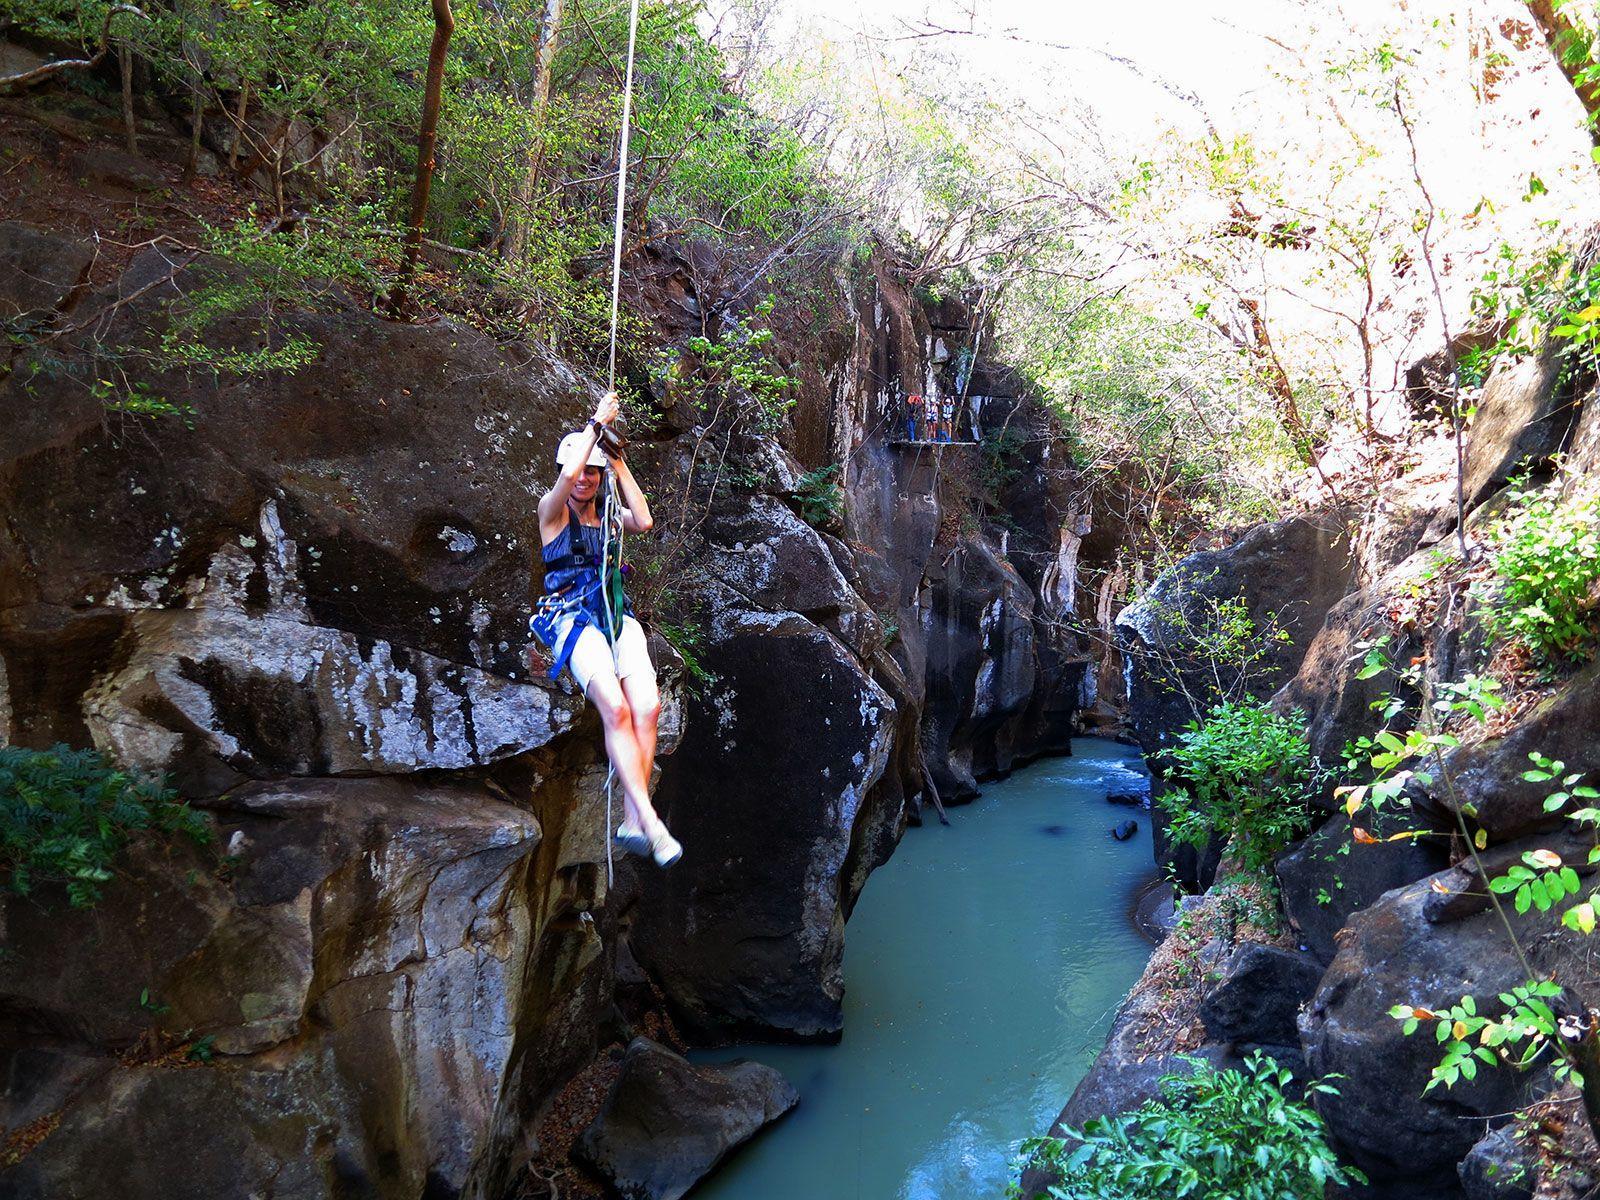 wp-content/uploads/itineraries/Costa-Rica/rio-perdido-river-1.jpg